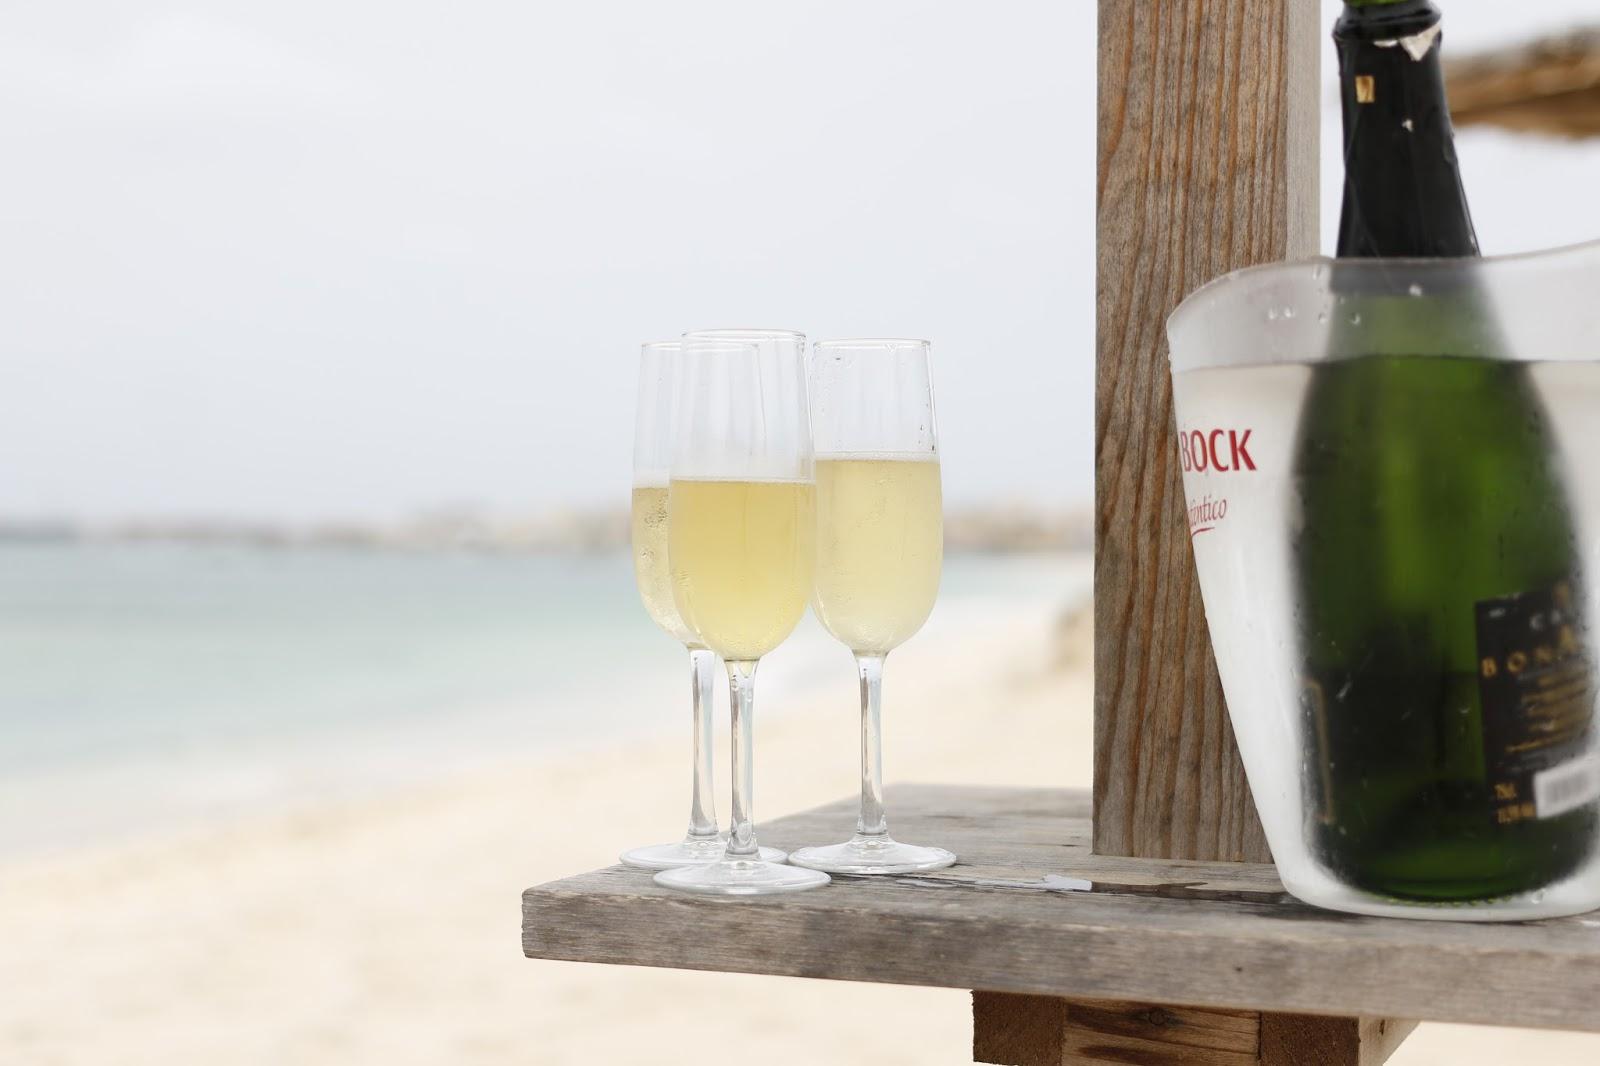 bahia-beach-boa-vista